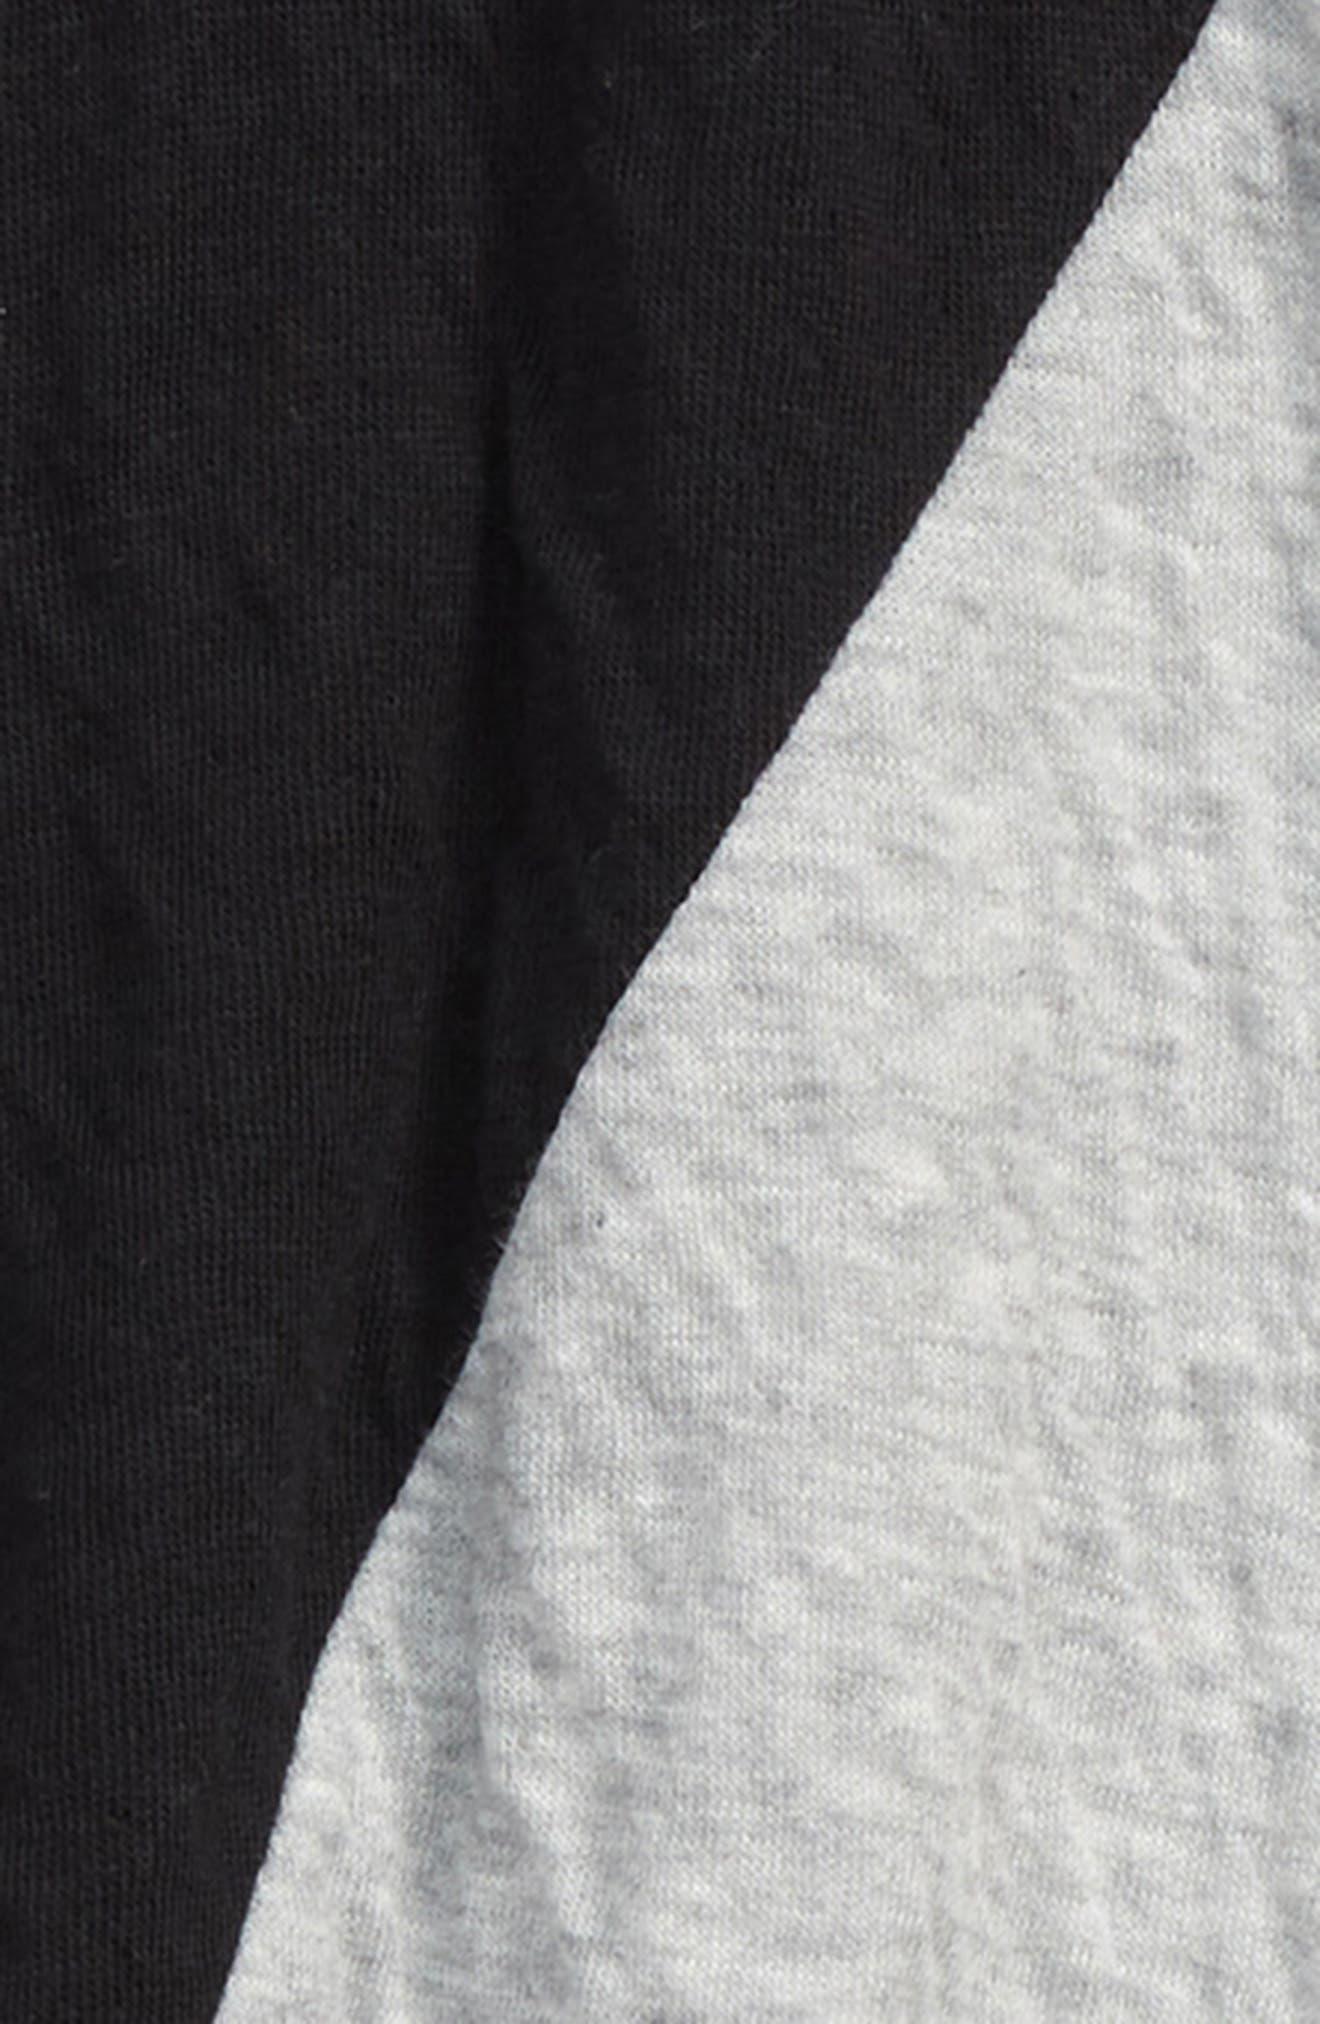 Colorblock Baggy Pants,                             Alternate thumbnail 2, color,                             BLACK/ HEATHER GREY